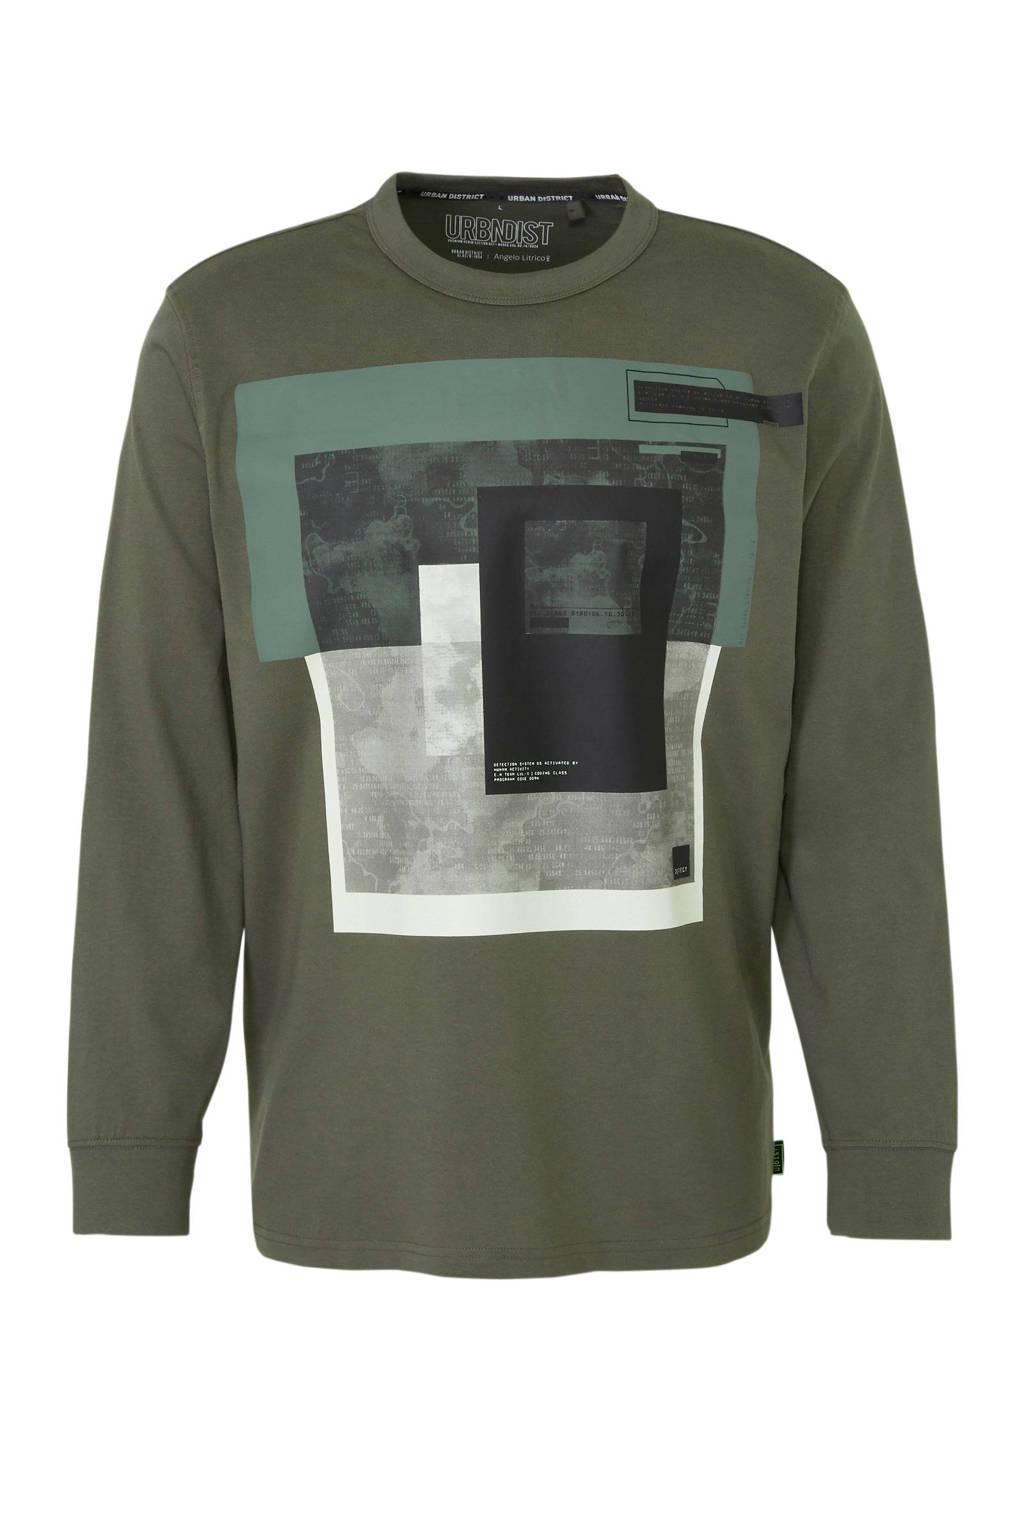 C&A Angelo Litrico T-shirt met printopdruk kaki/wit/groen, Kaki/wit/groen